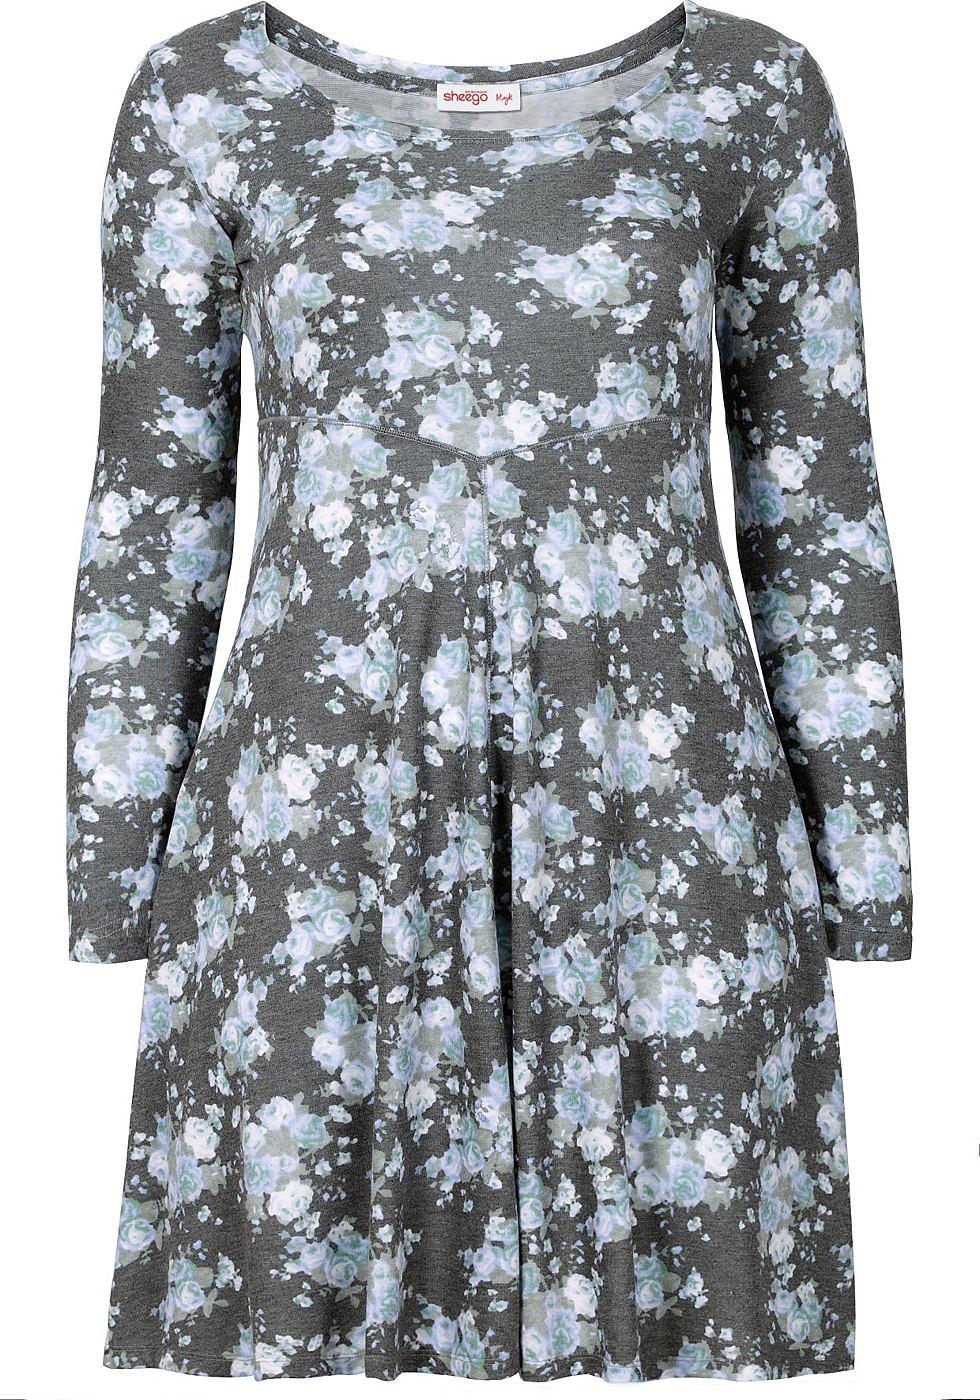 Sheego Style jurk met allover-print grijs